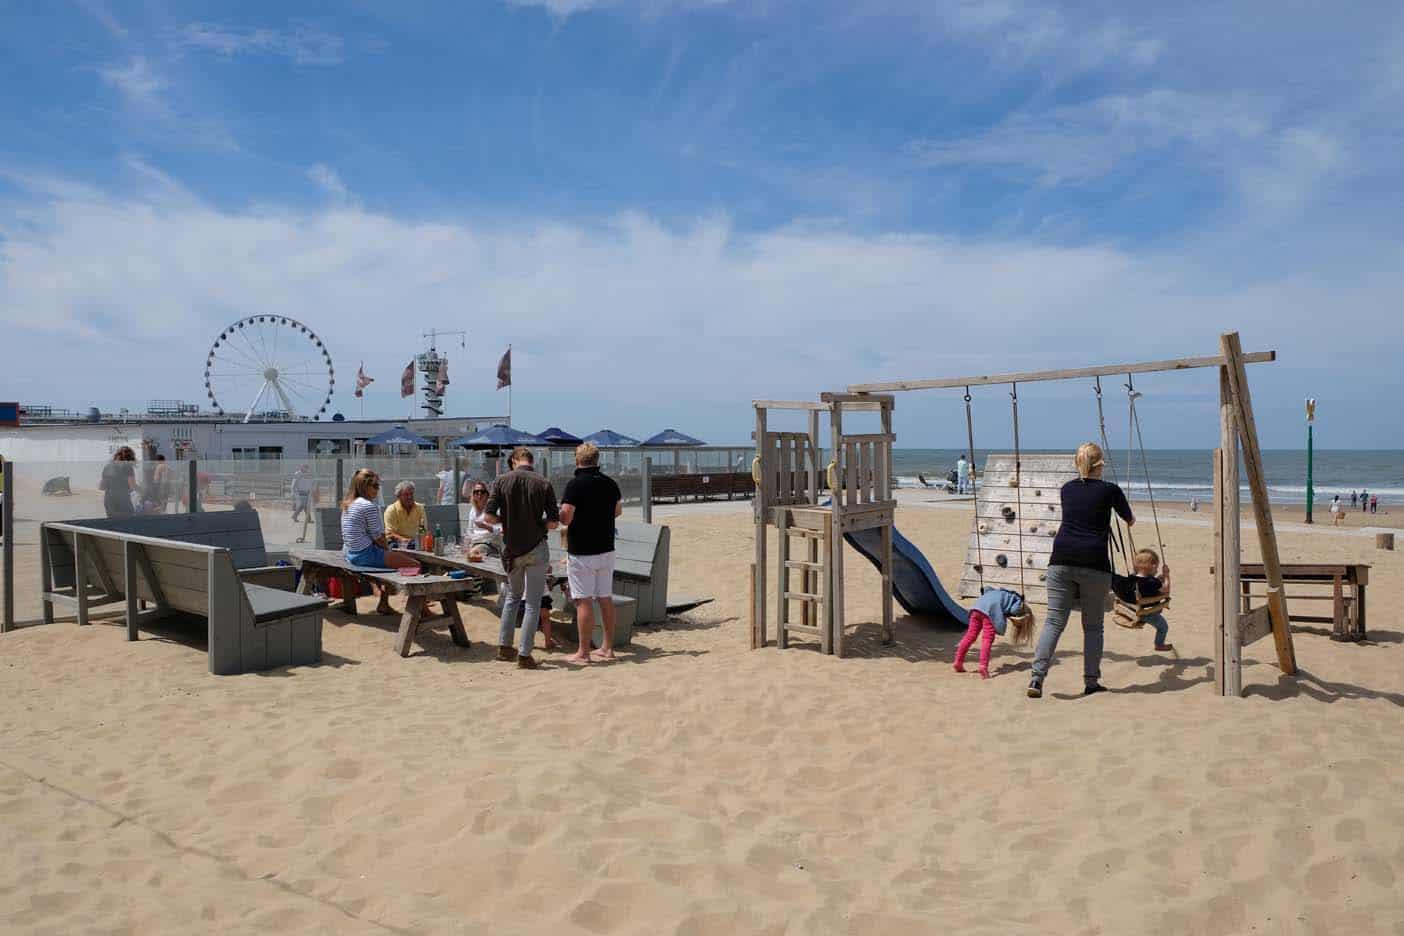 scheveningen strandtent kindvriendelijk